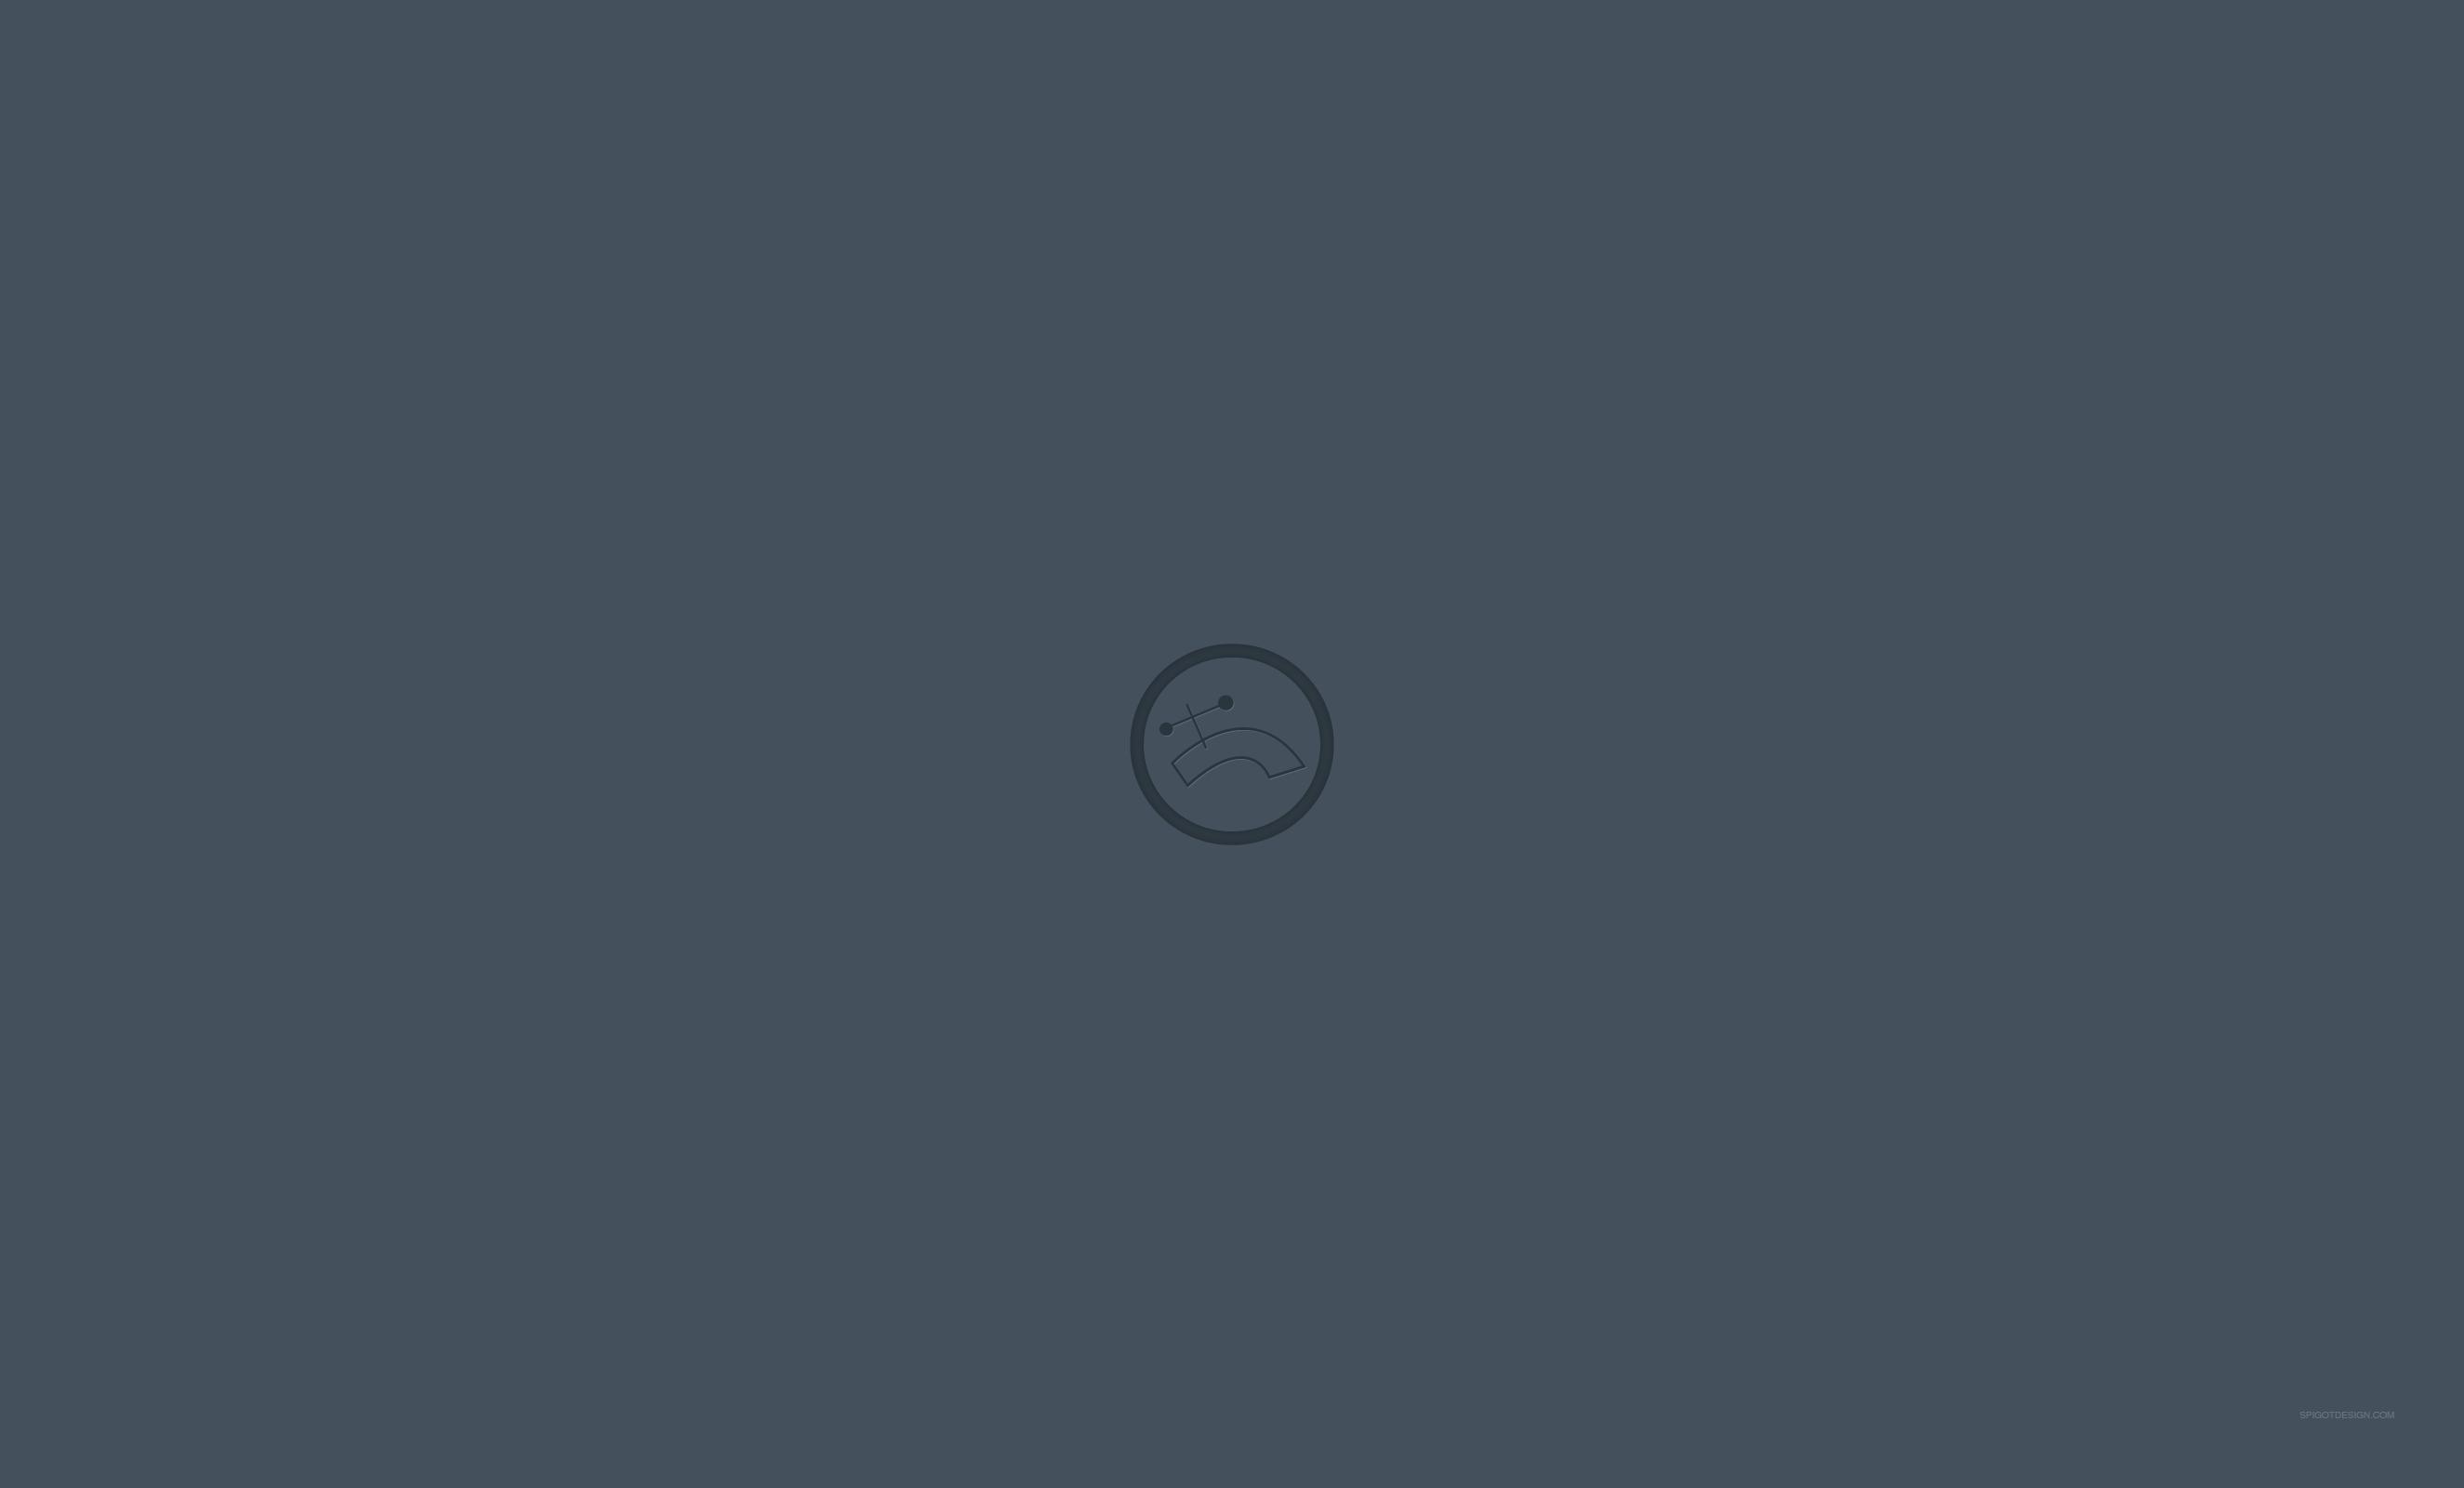 minimalist style desktop hd - photo #46